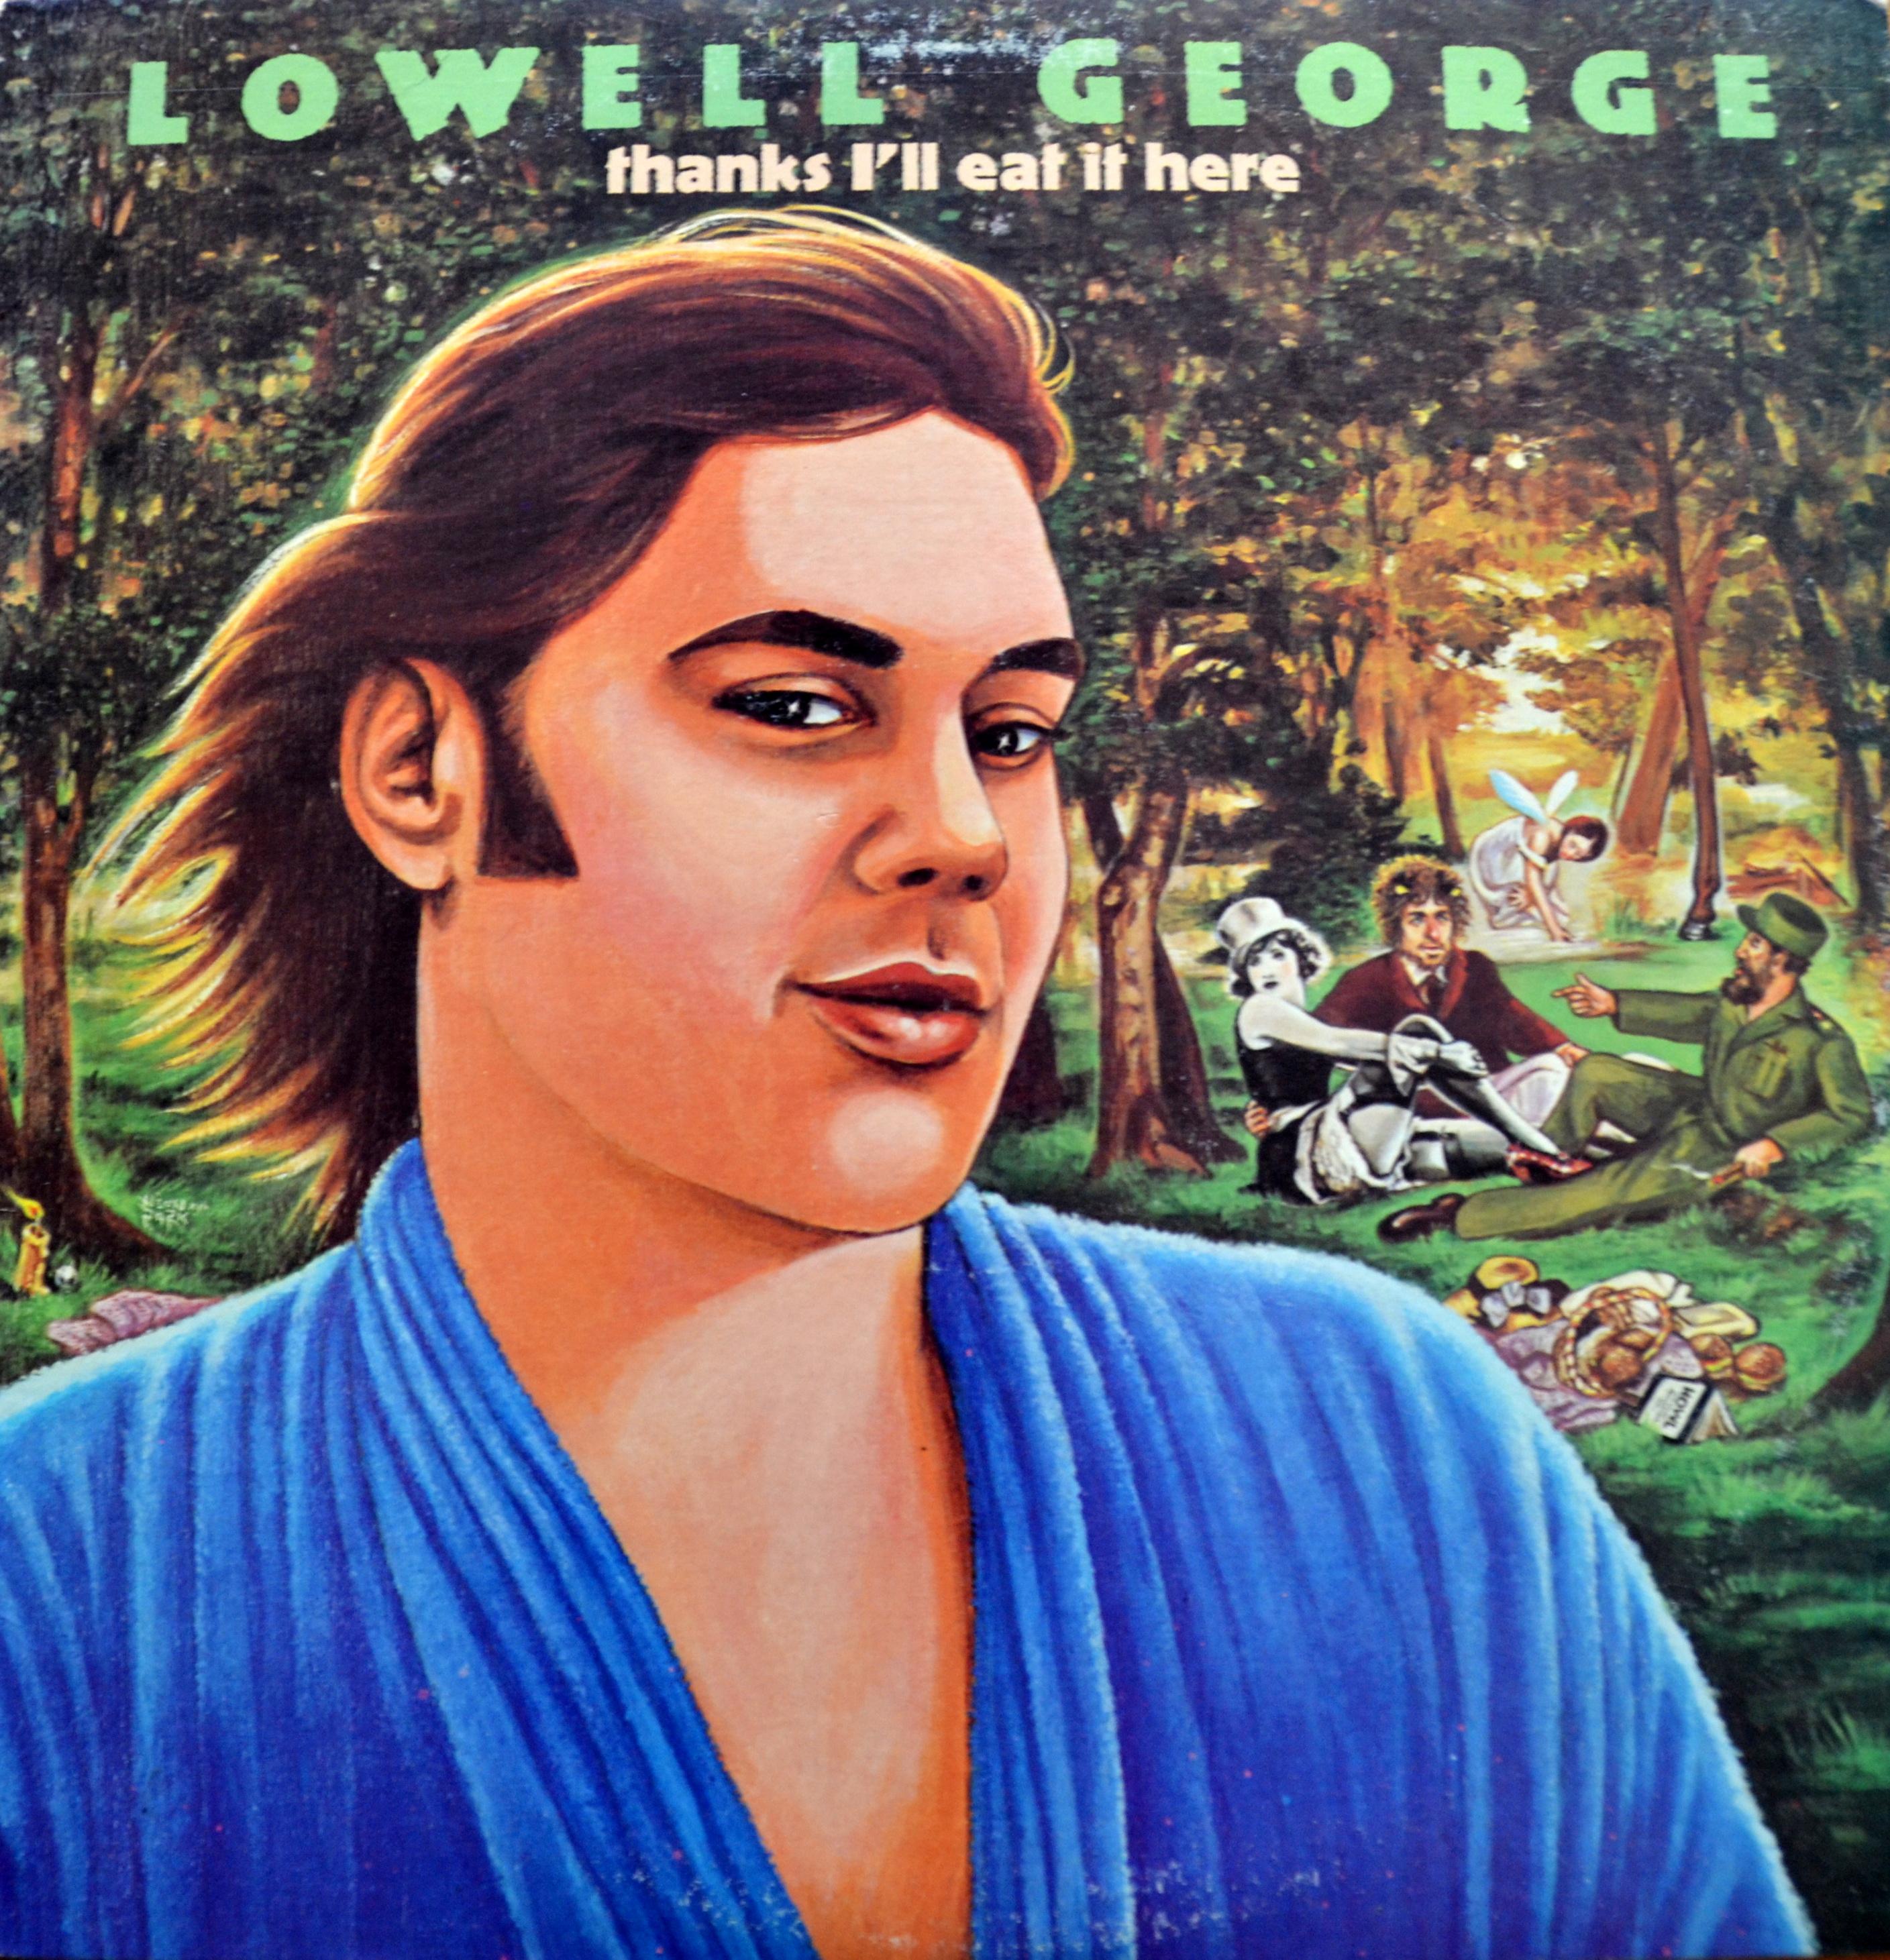 lowell_george_thanks